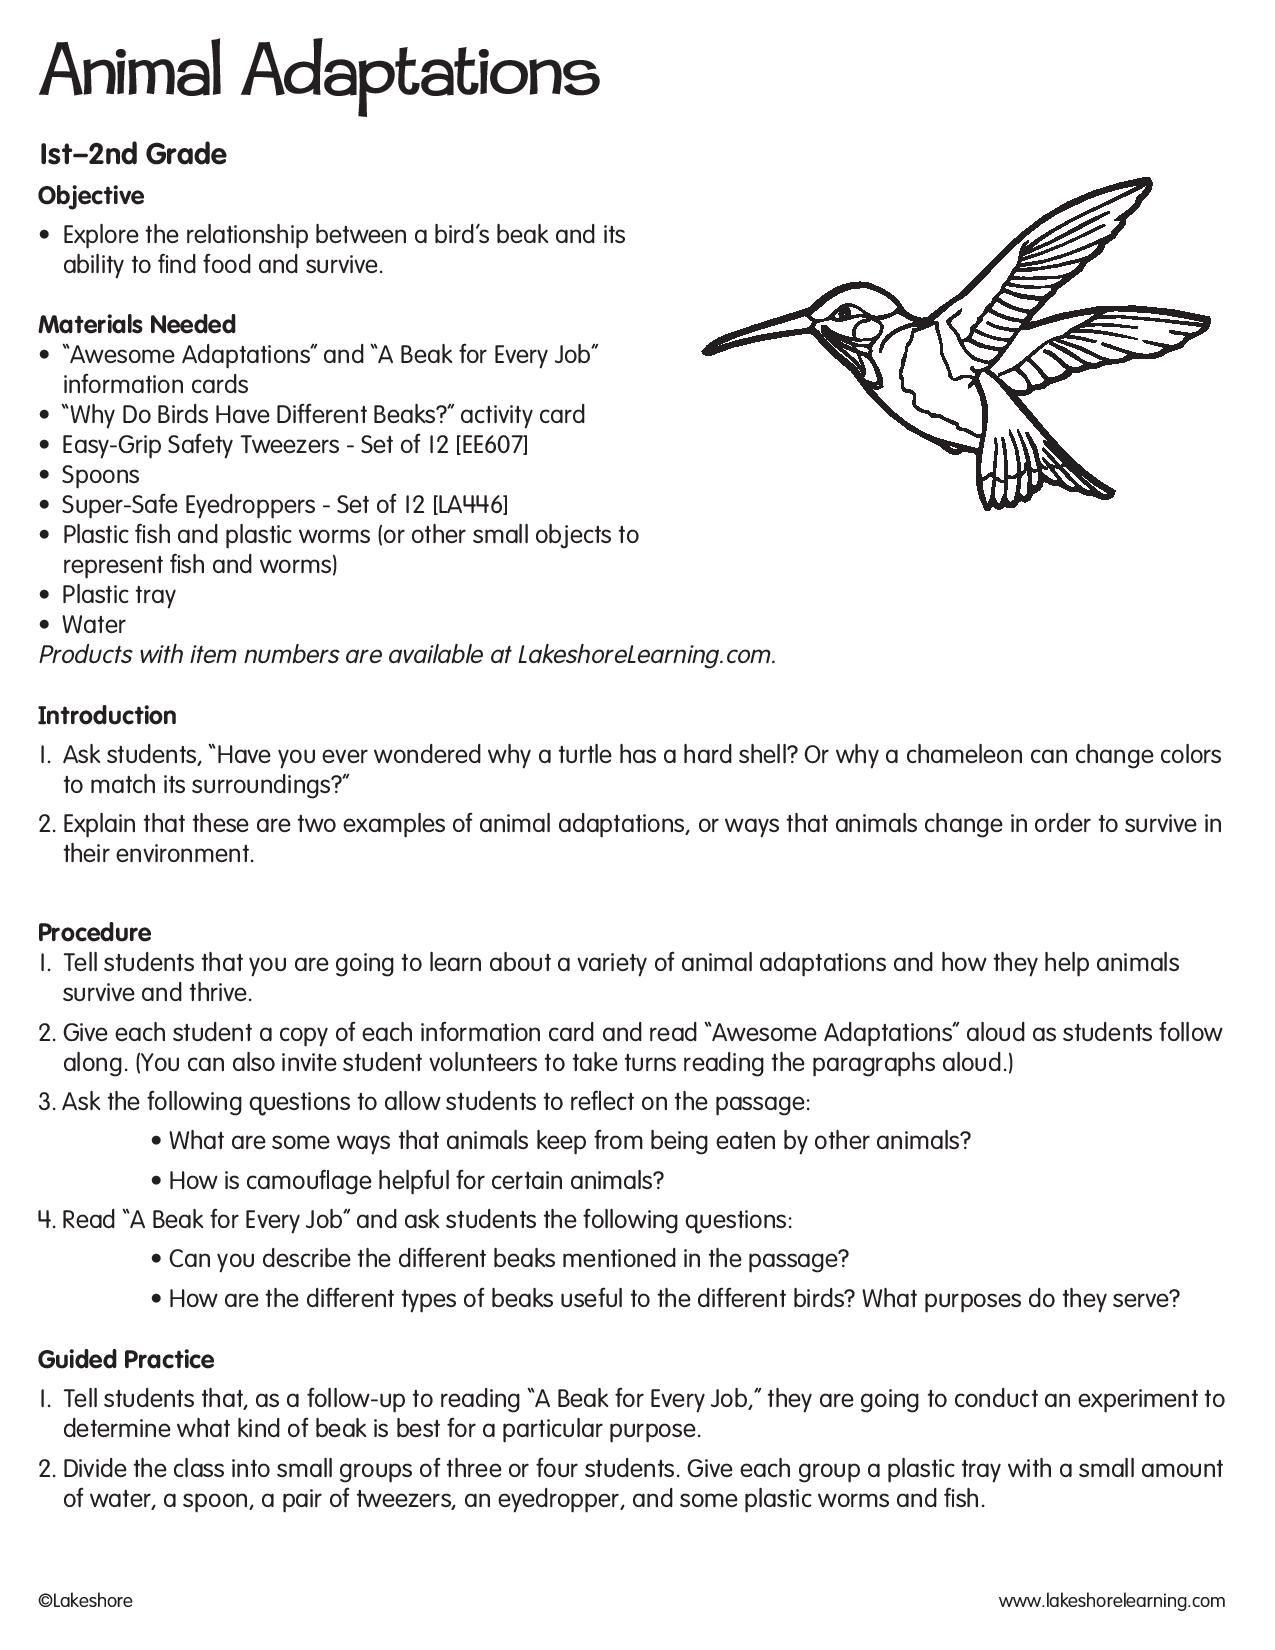 Animal Adaptations Lessonplan